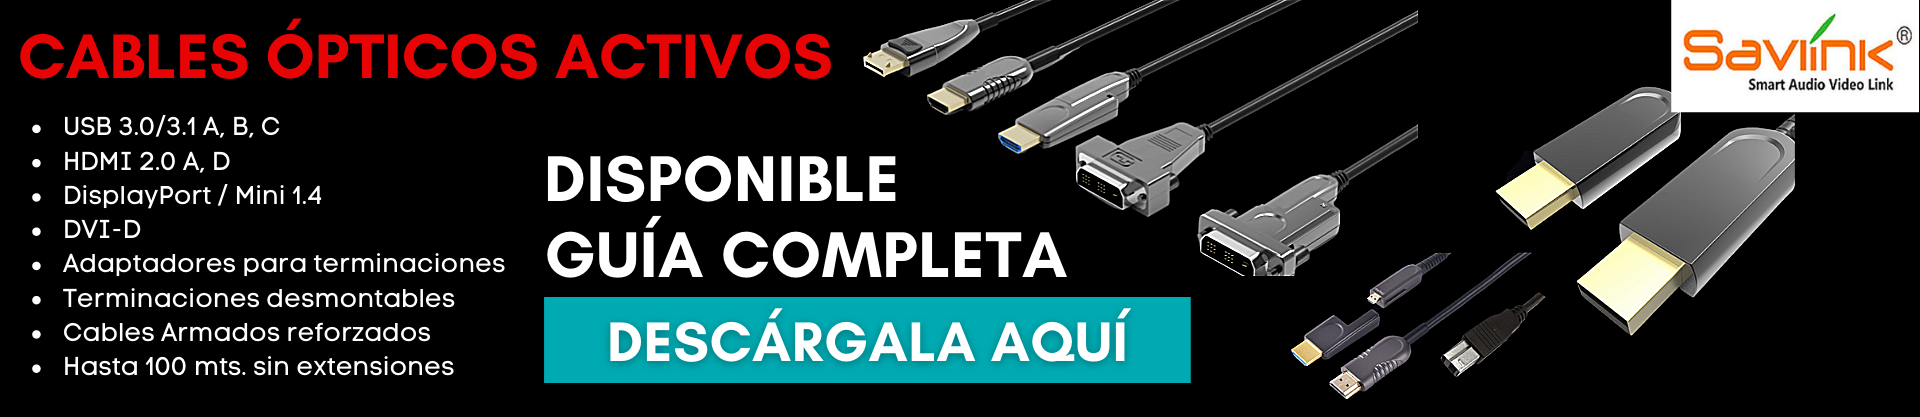 catalogo-comparativa-tecnica-cables-AOC-savlink